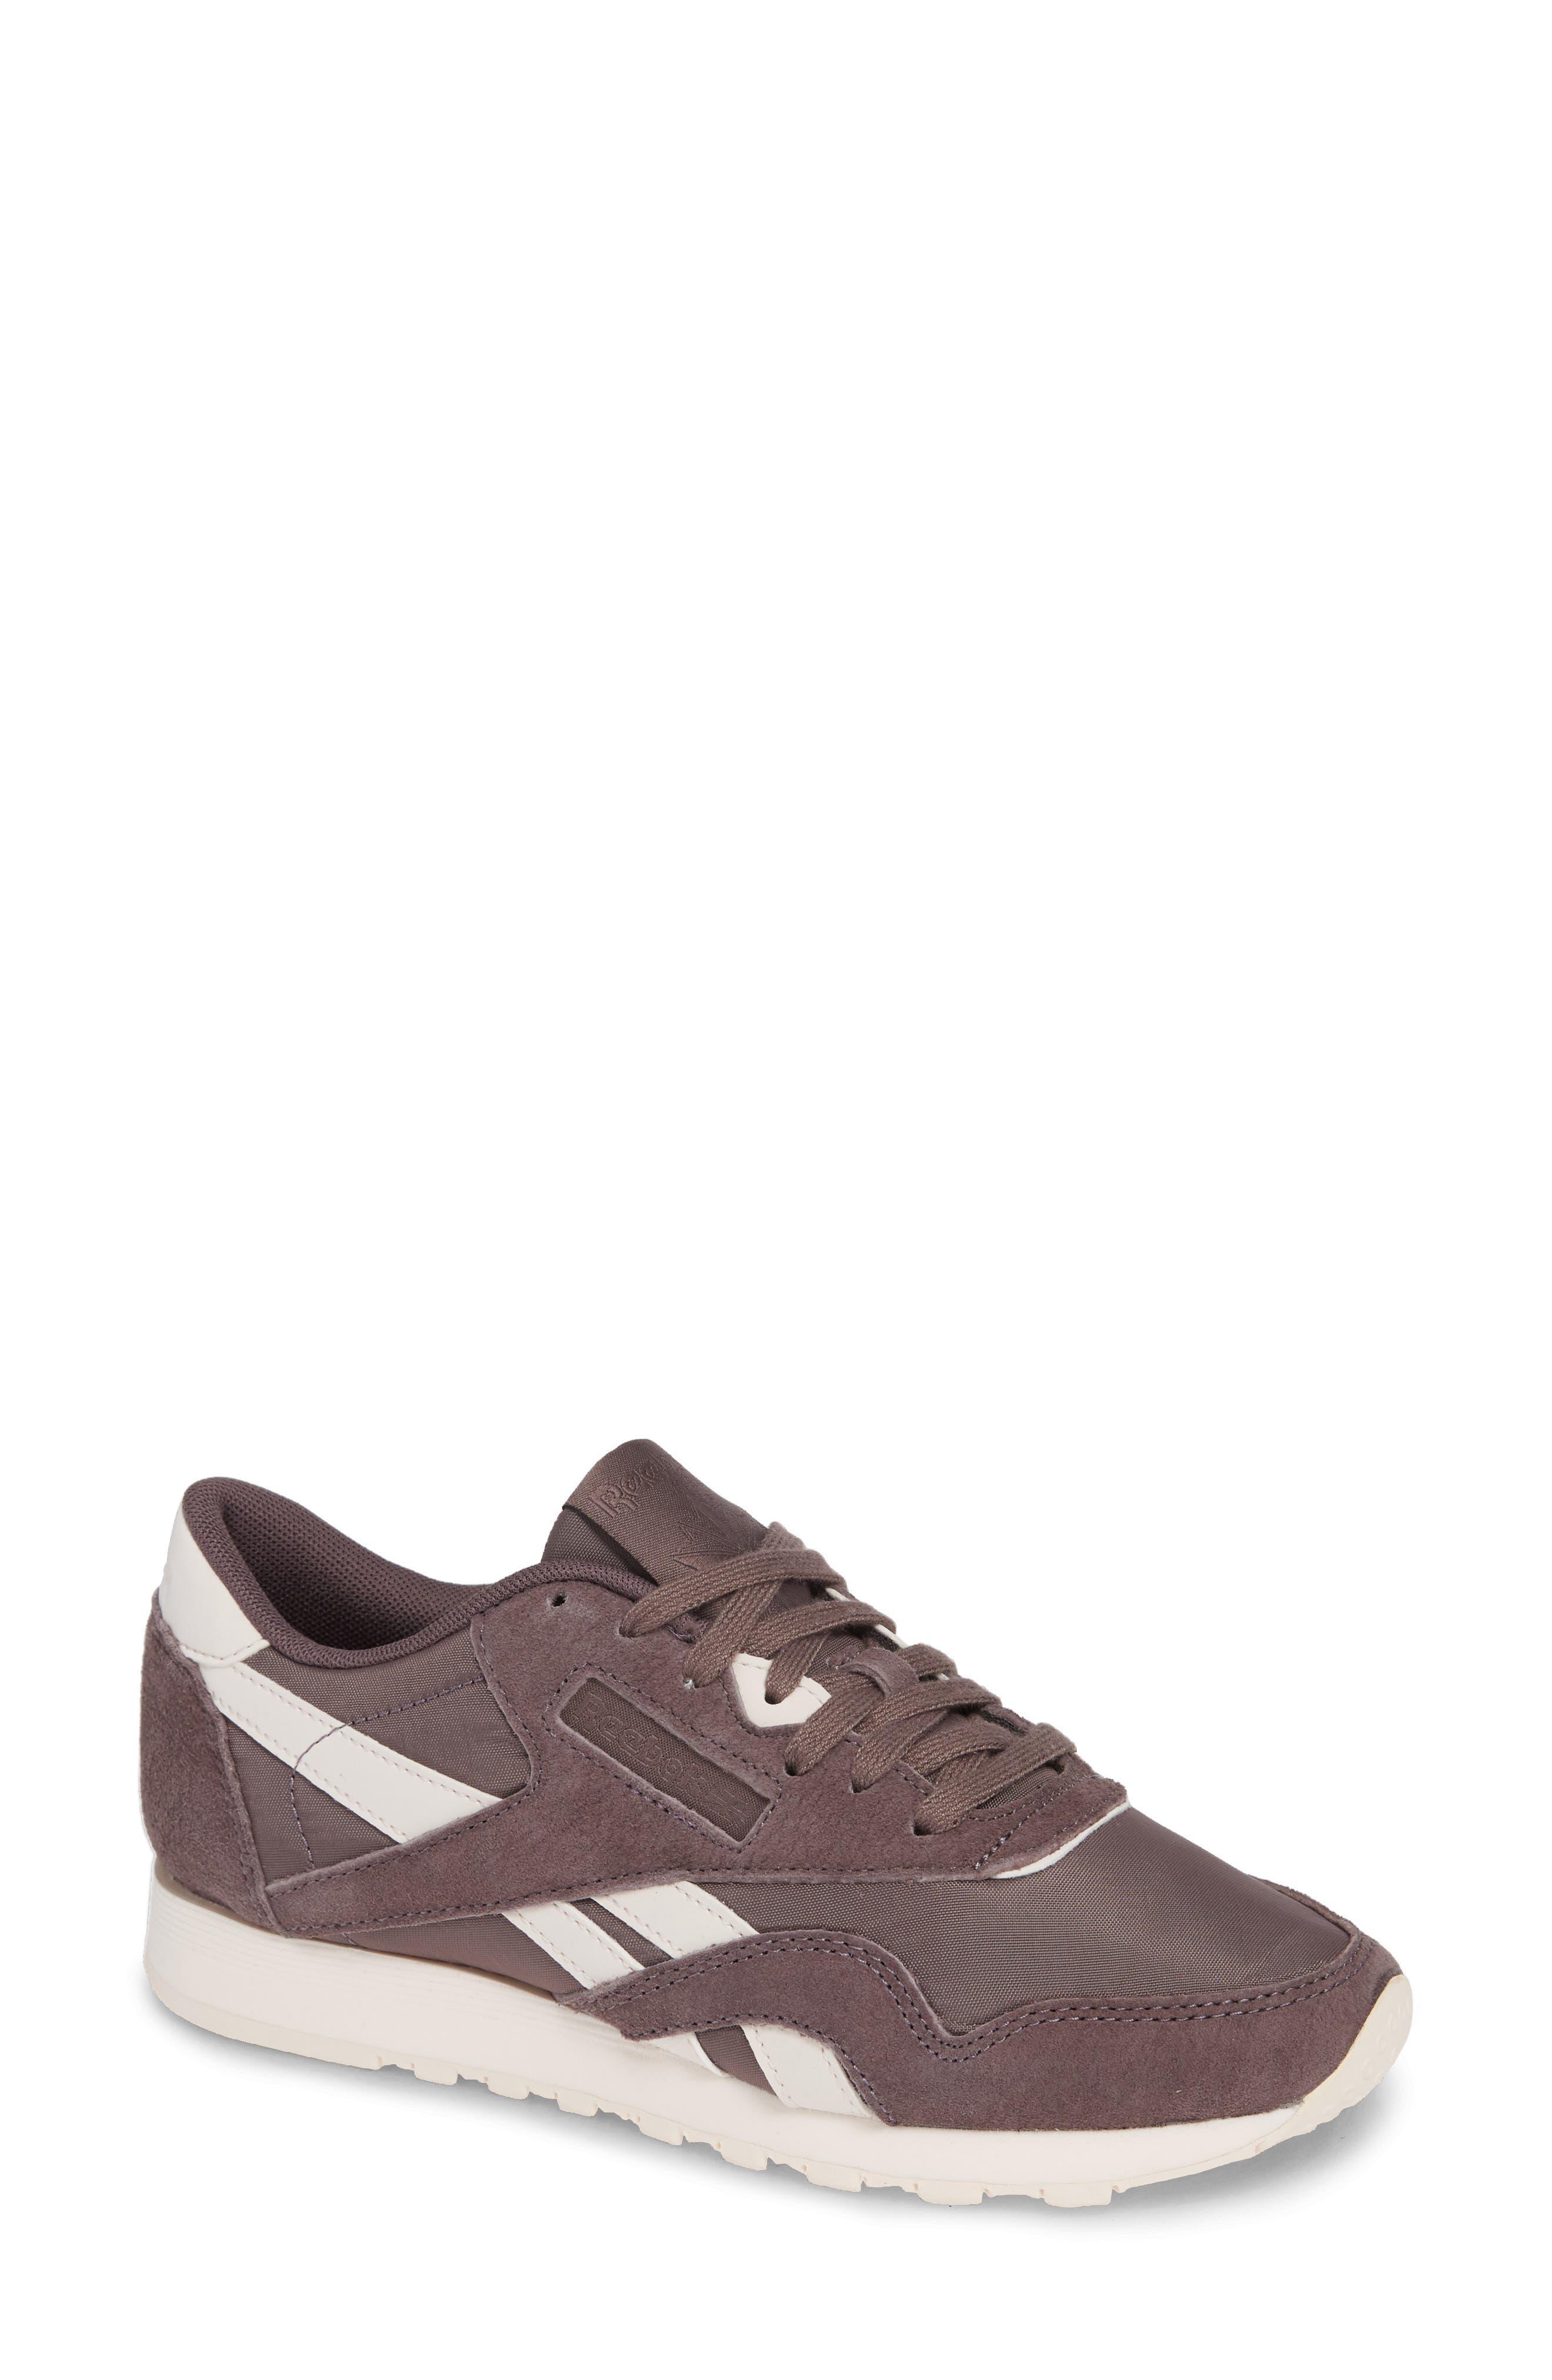 Classic Sneaker,                             Main thumbnail 1, color,                             020